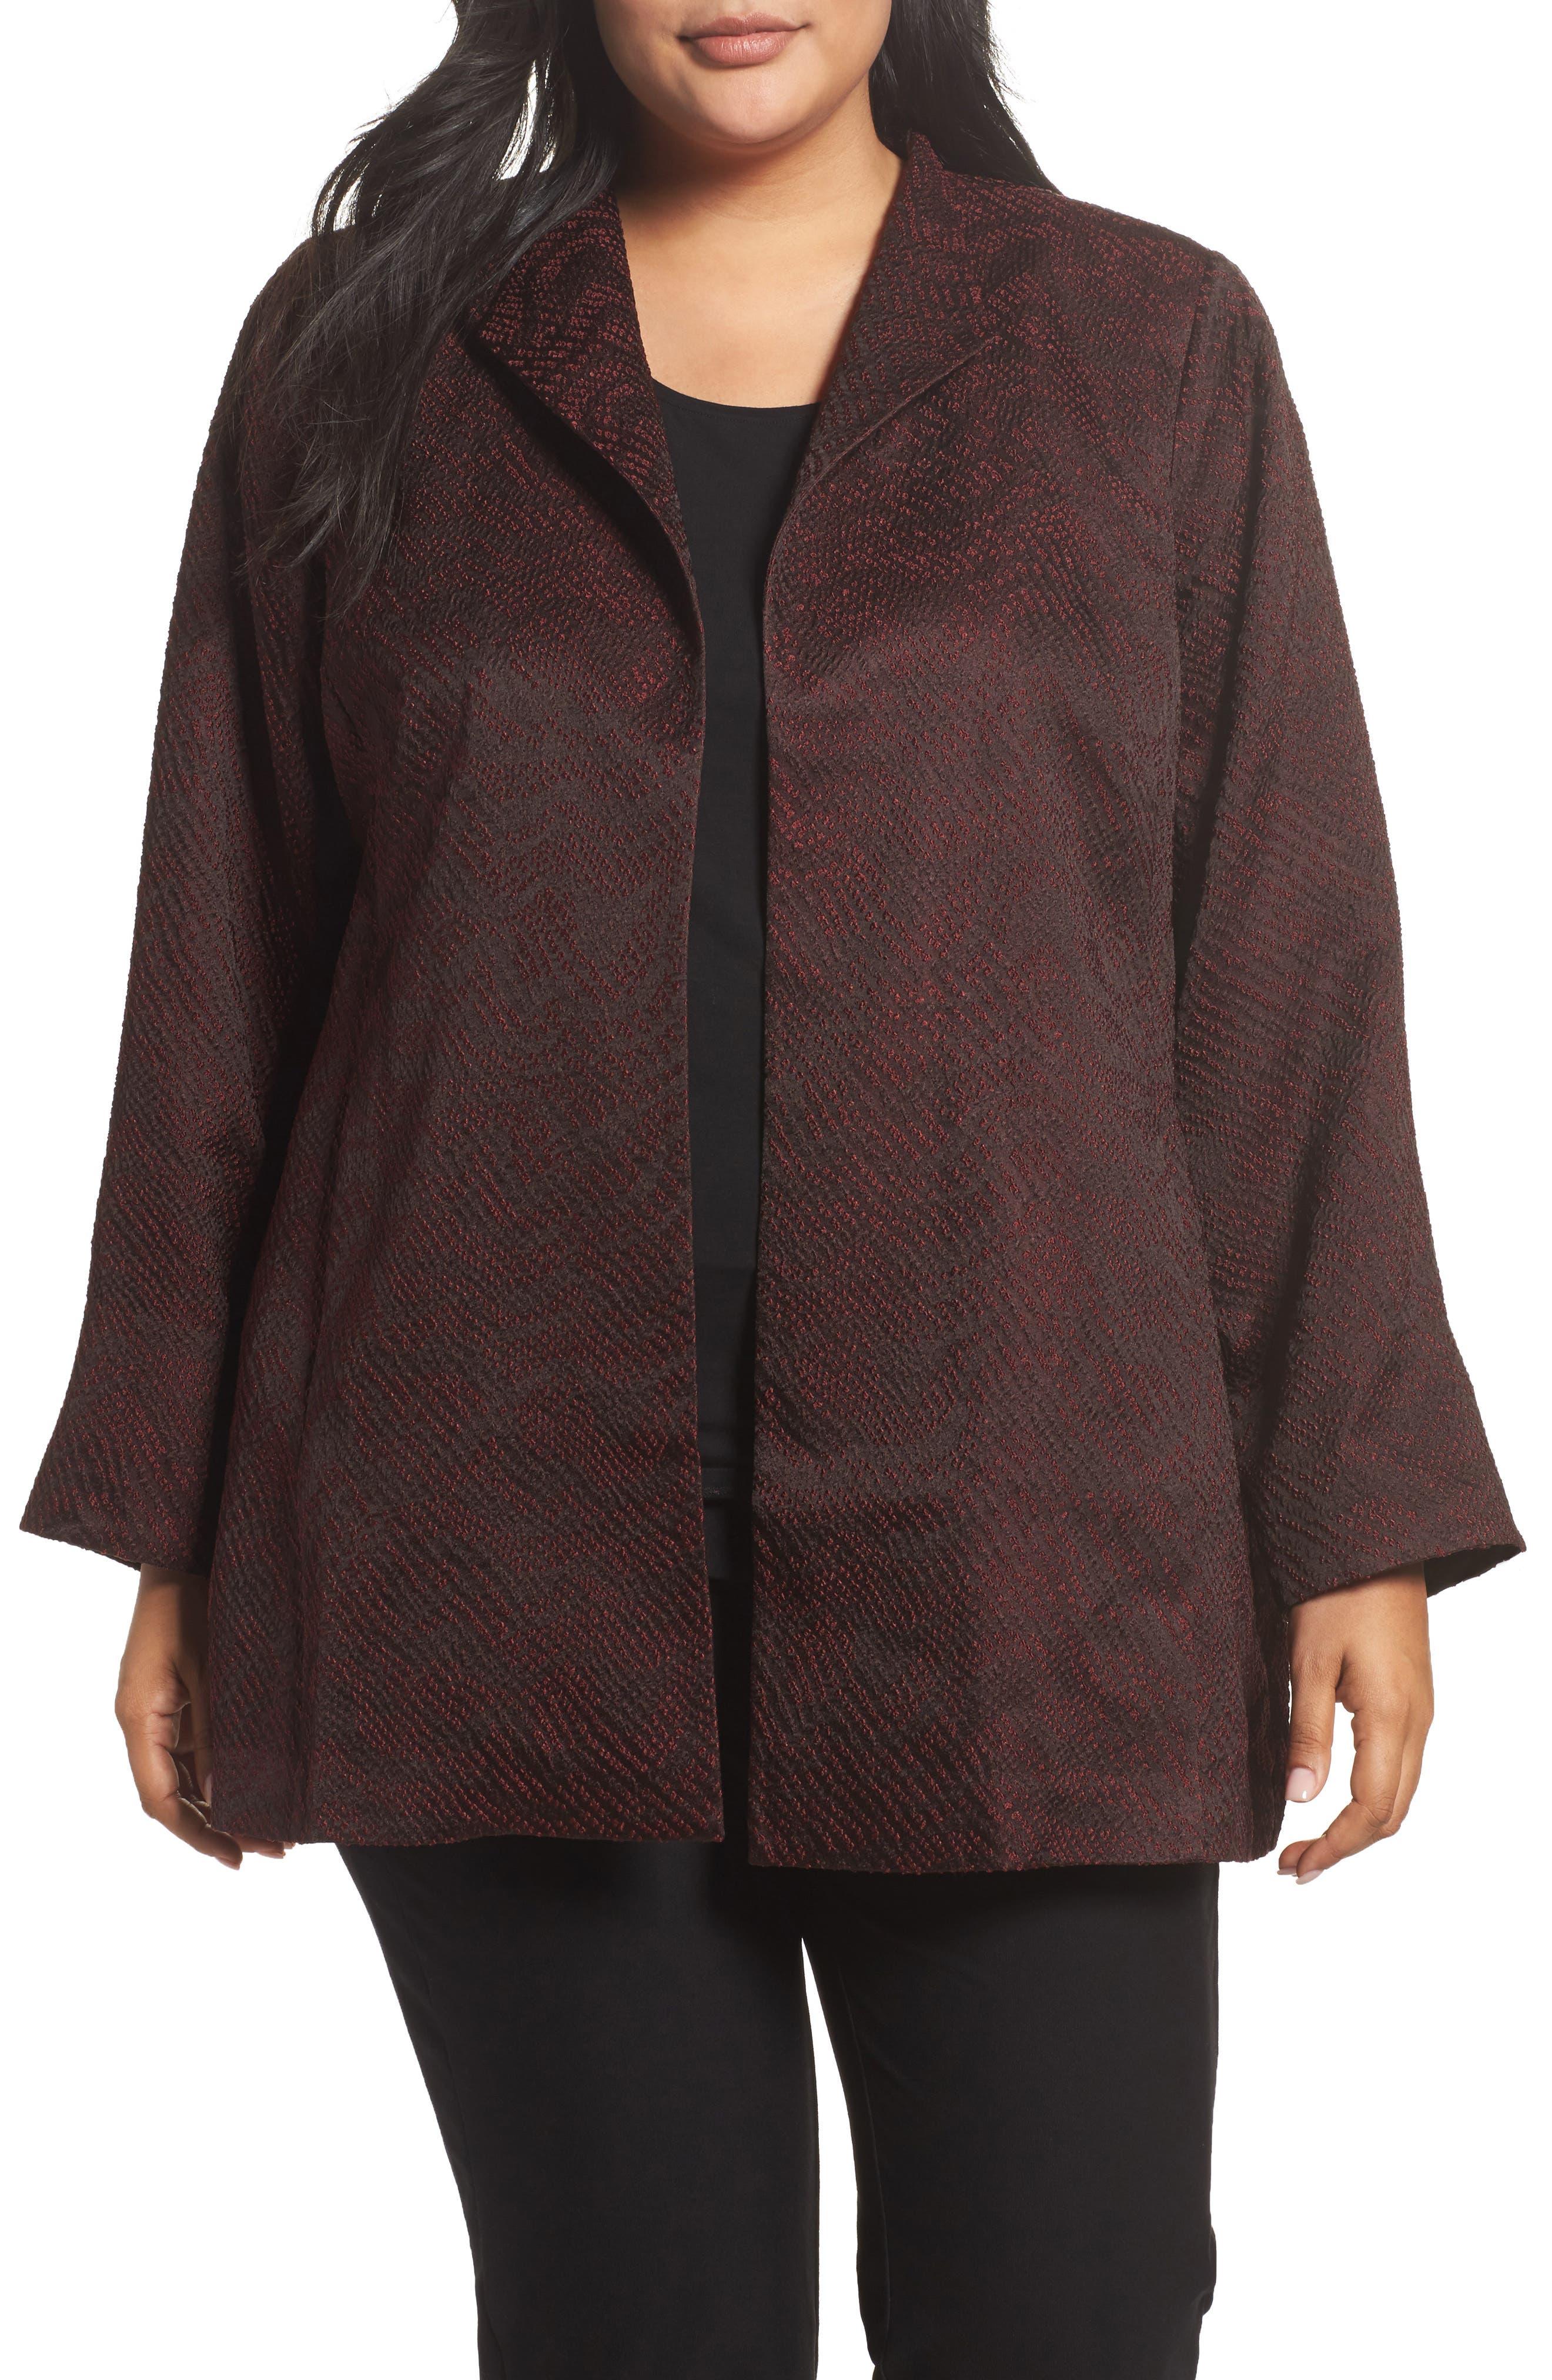 Alternate Image 1 Selected - Eileen Fisher Silk Blend Jacquard Jacket (Plus Size)